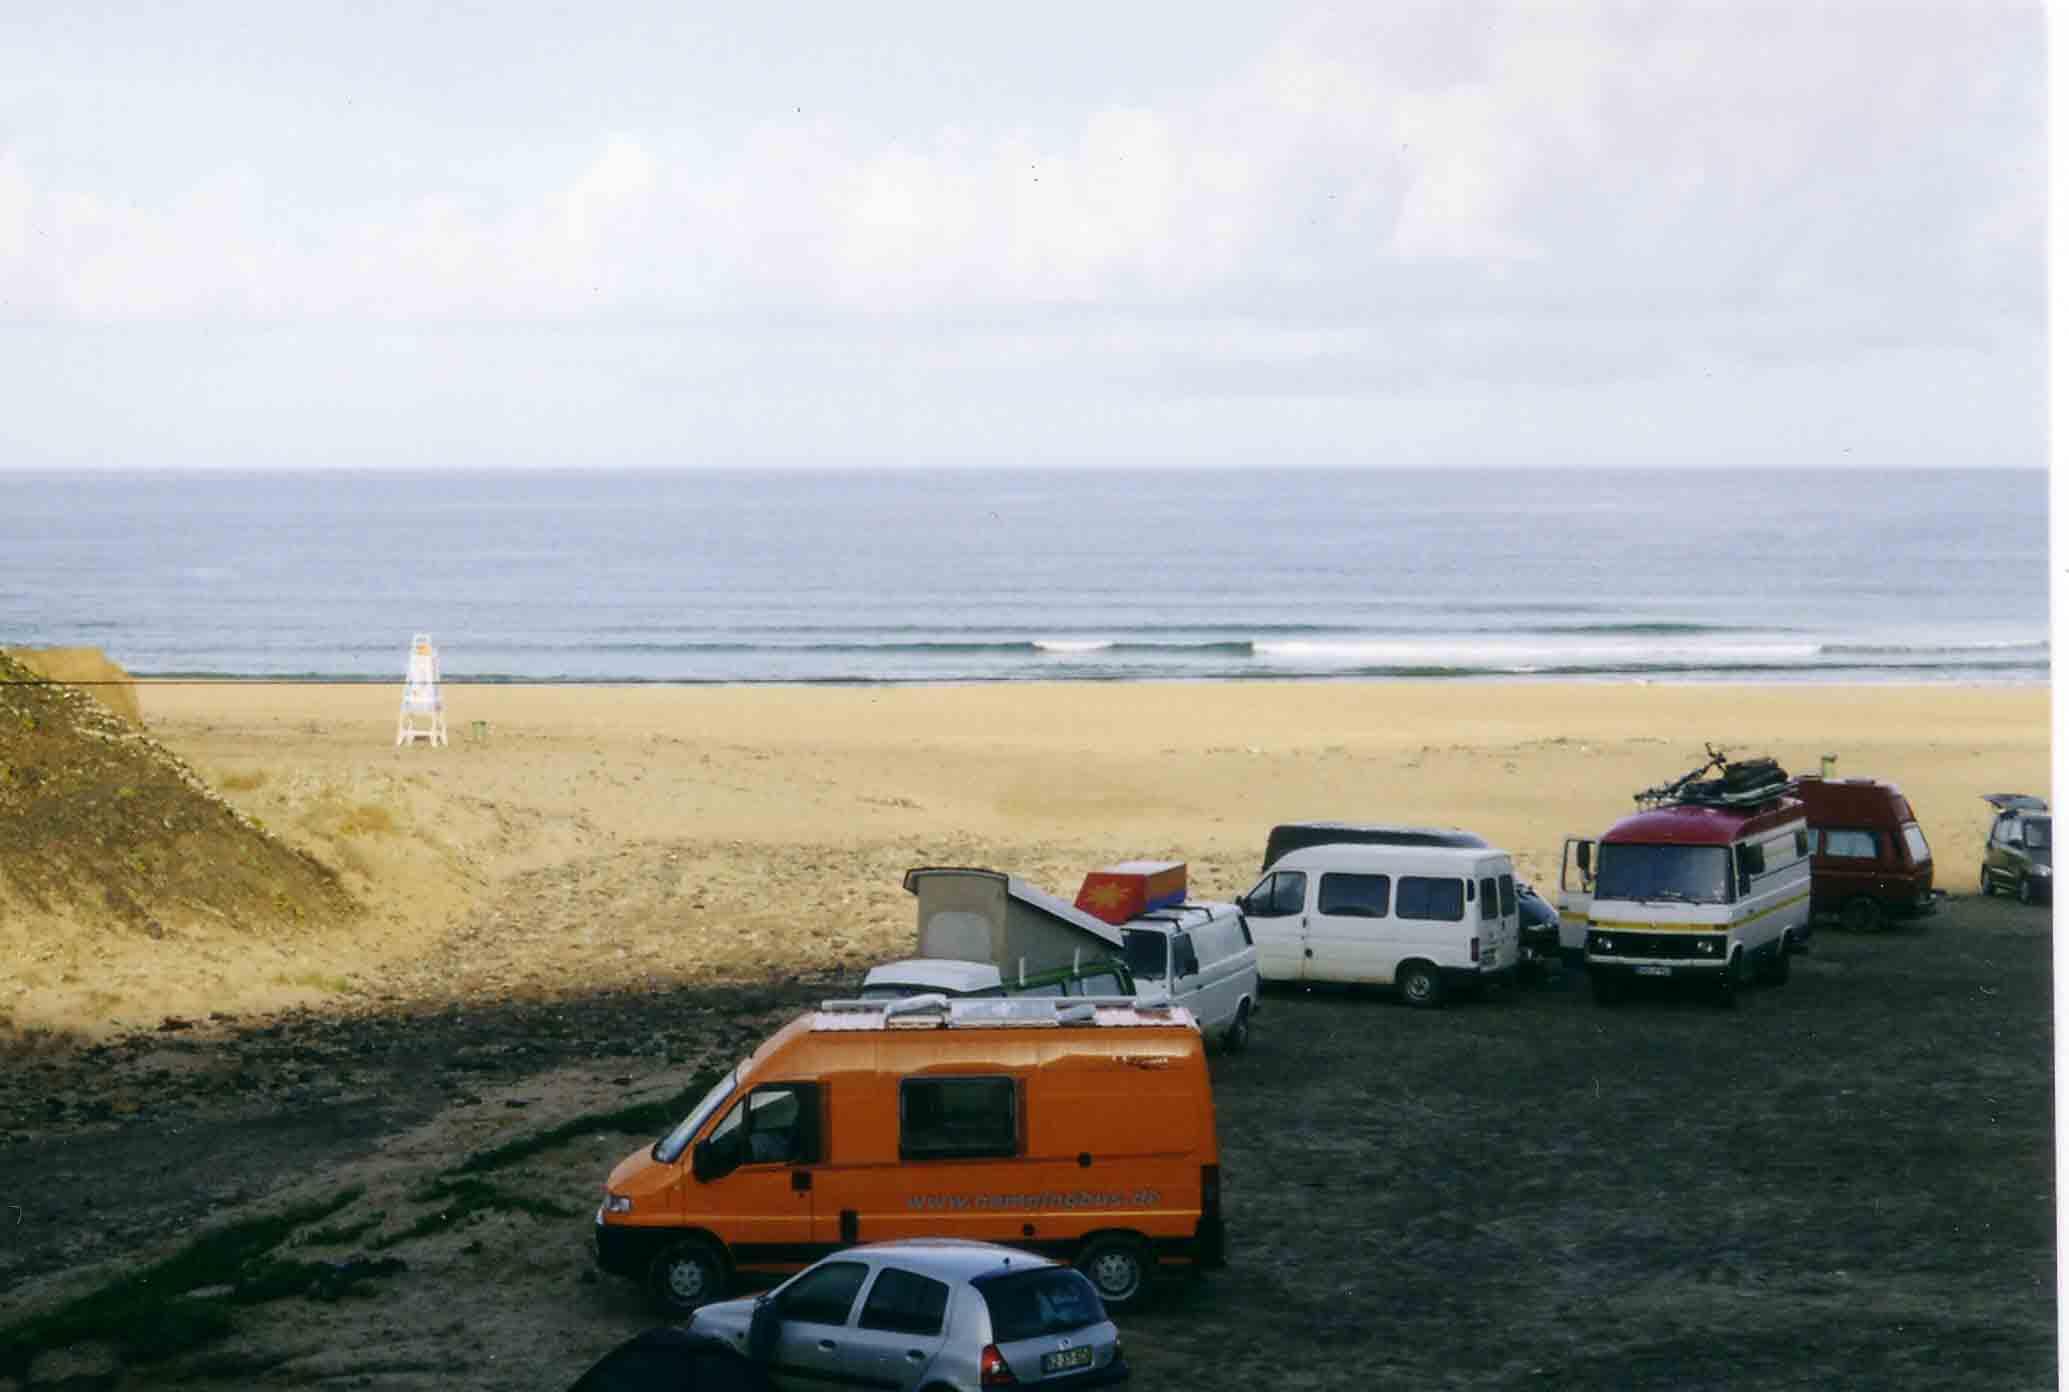 Wohnmobil Camping Campingplätze Portugal Reisemobil Algarve